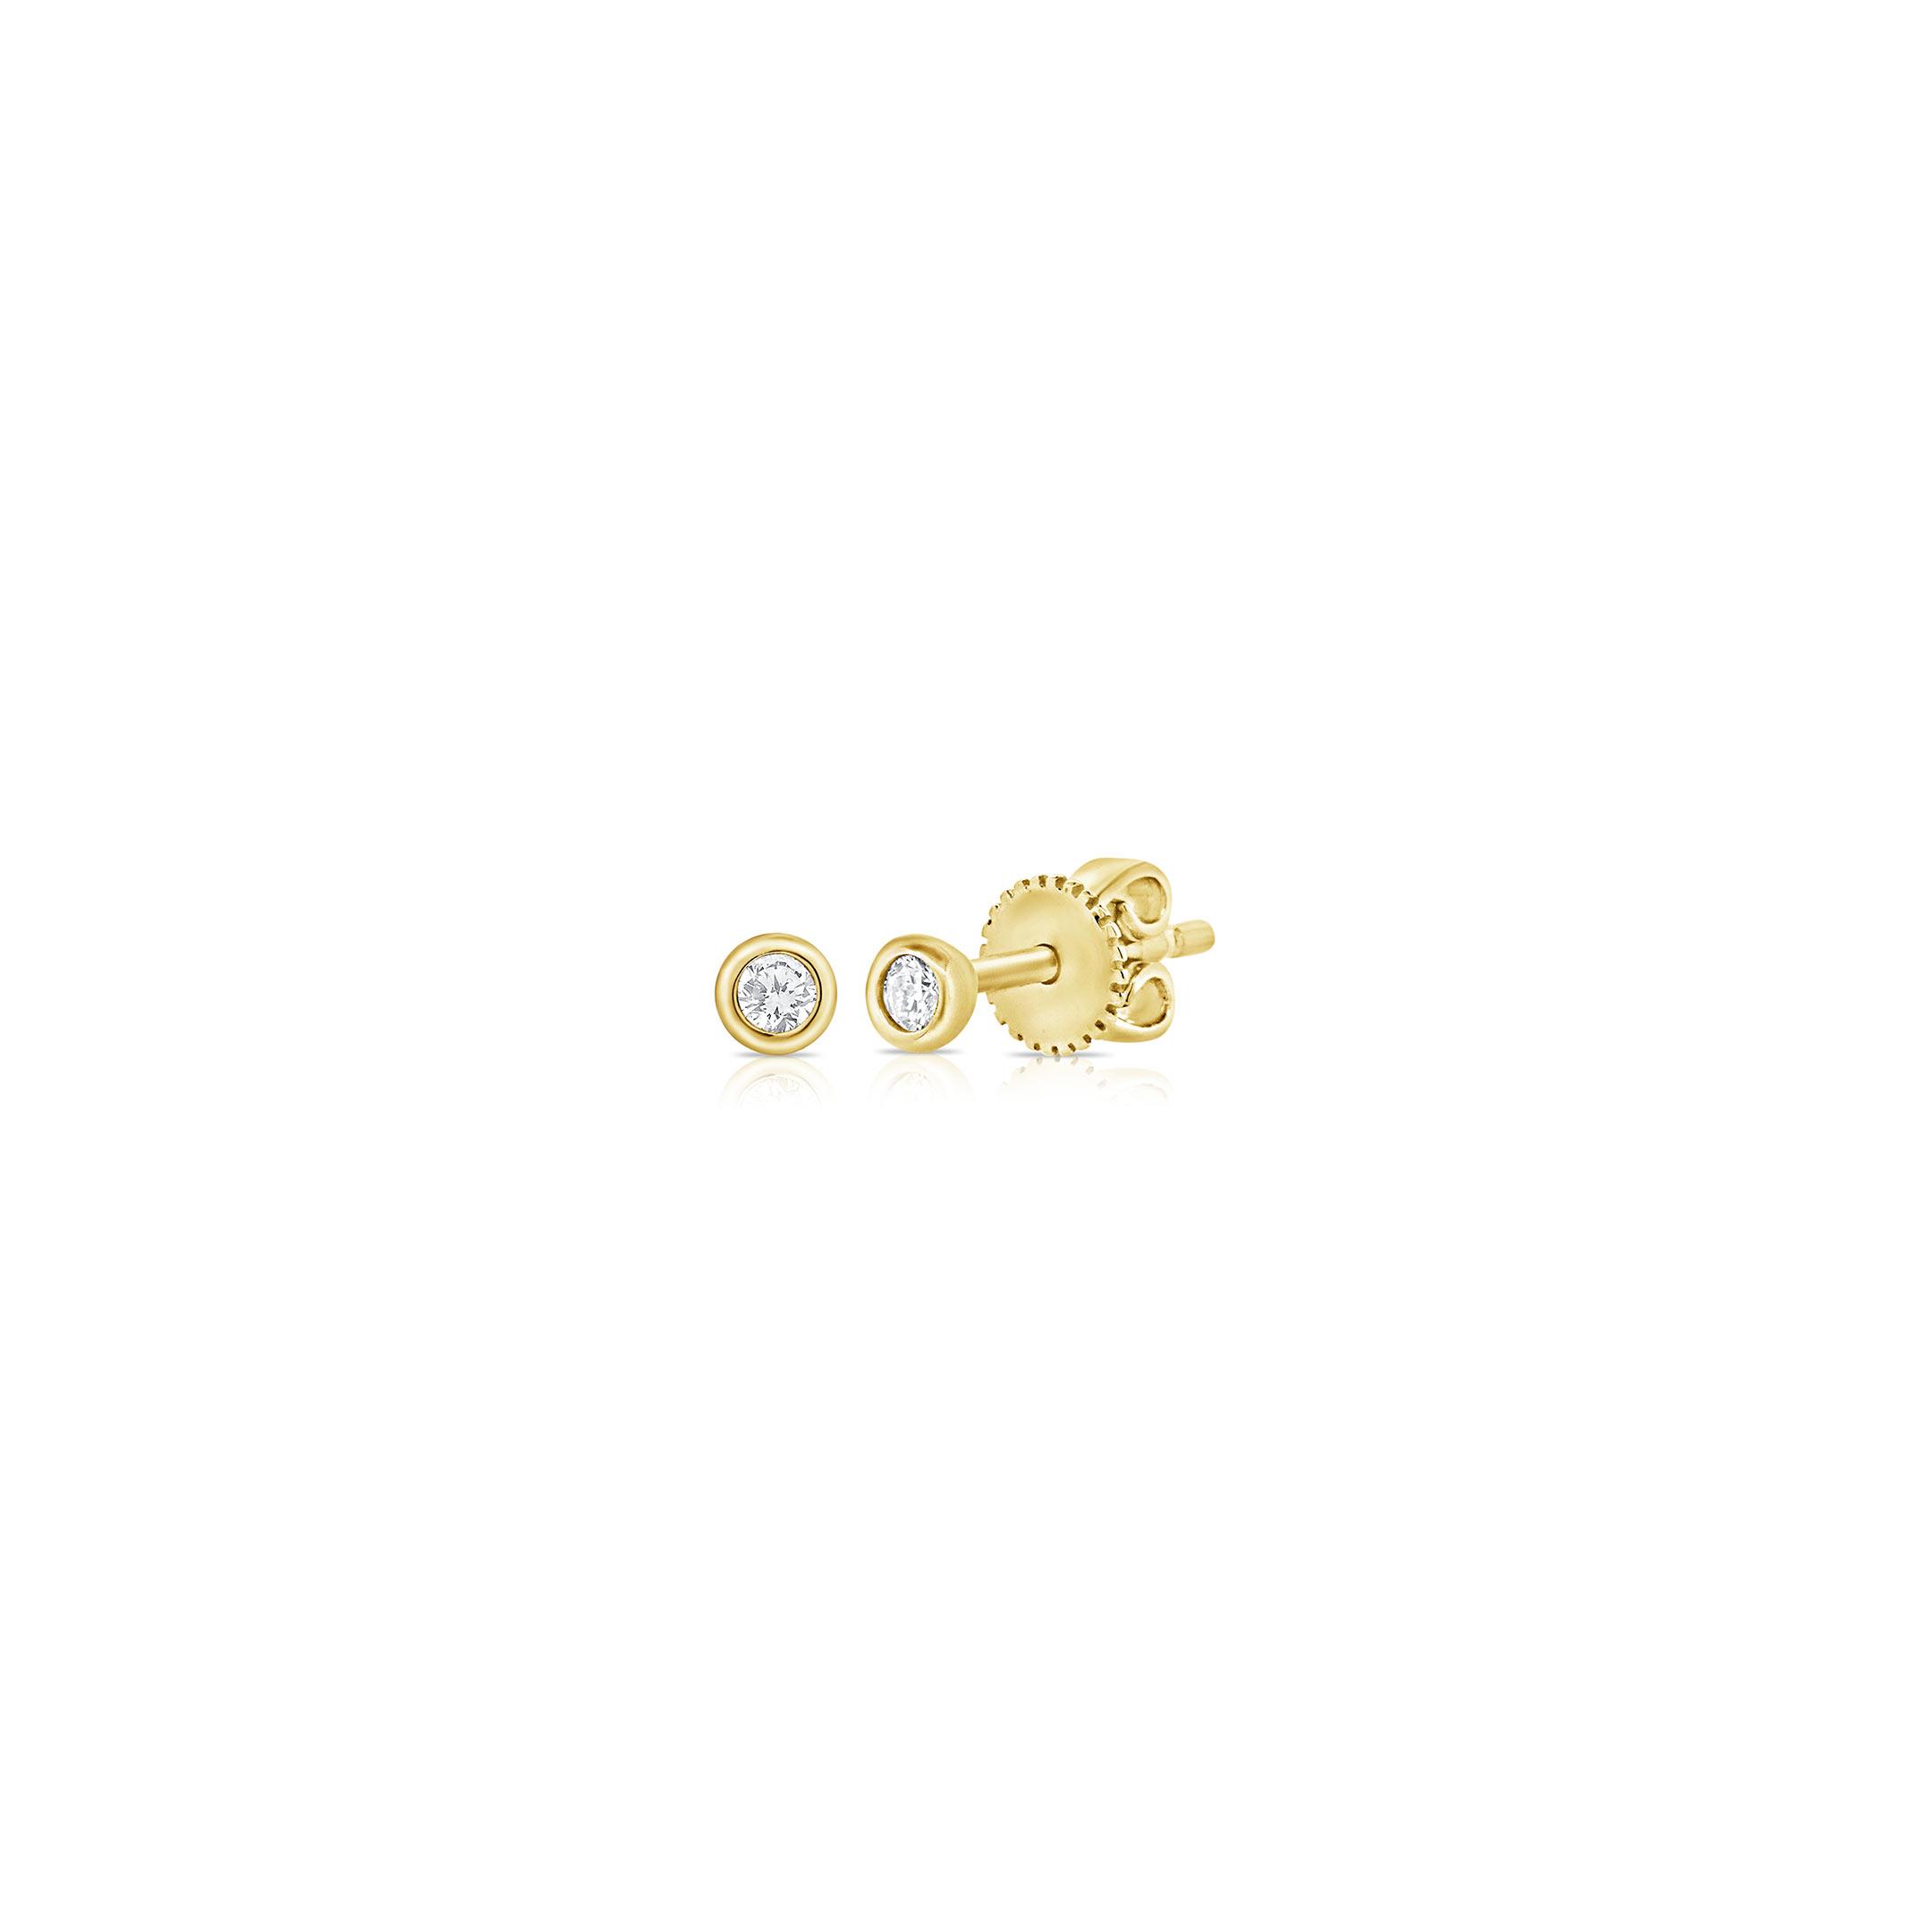 tiny stud earrings - 14k yellow gold beveled diamond earrings